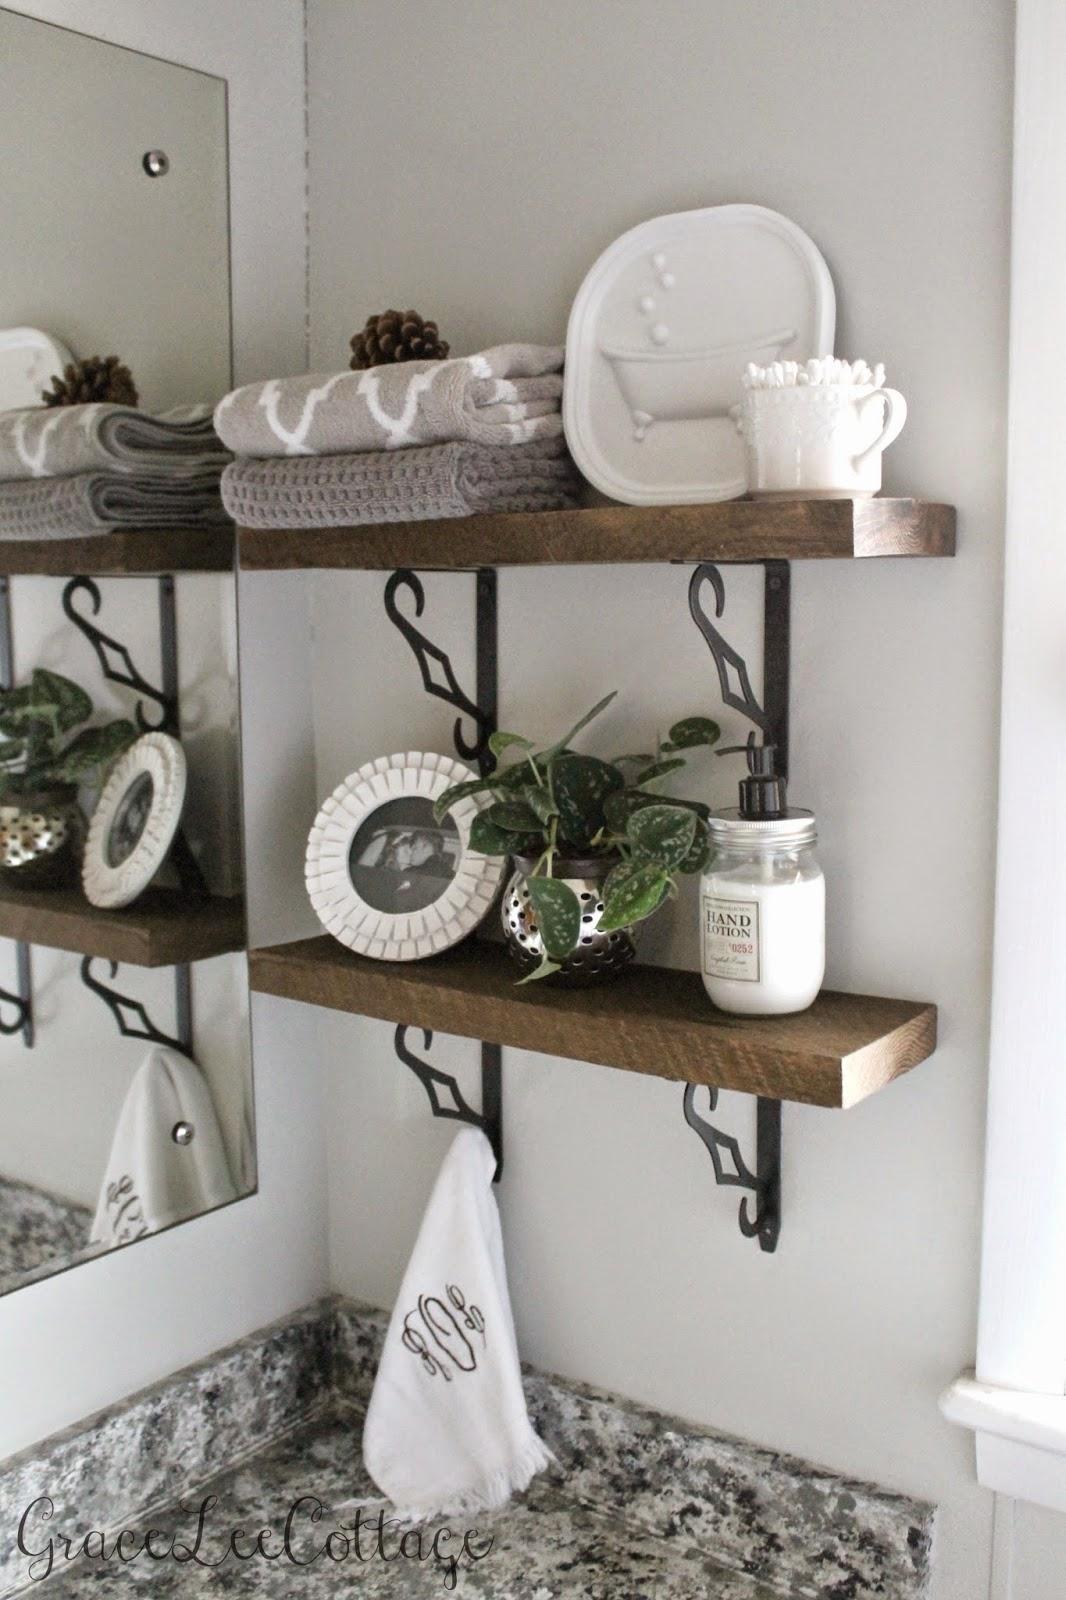 Grace Lee Cottage DIY Rustic Bathroom Shelves - White bathroom shelf with hooks for bathroom decor ideas